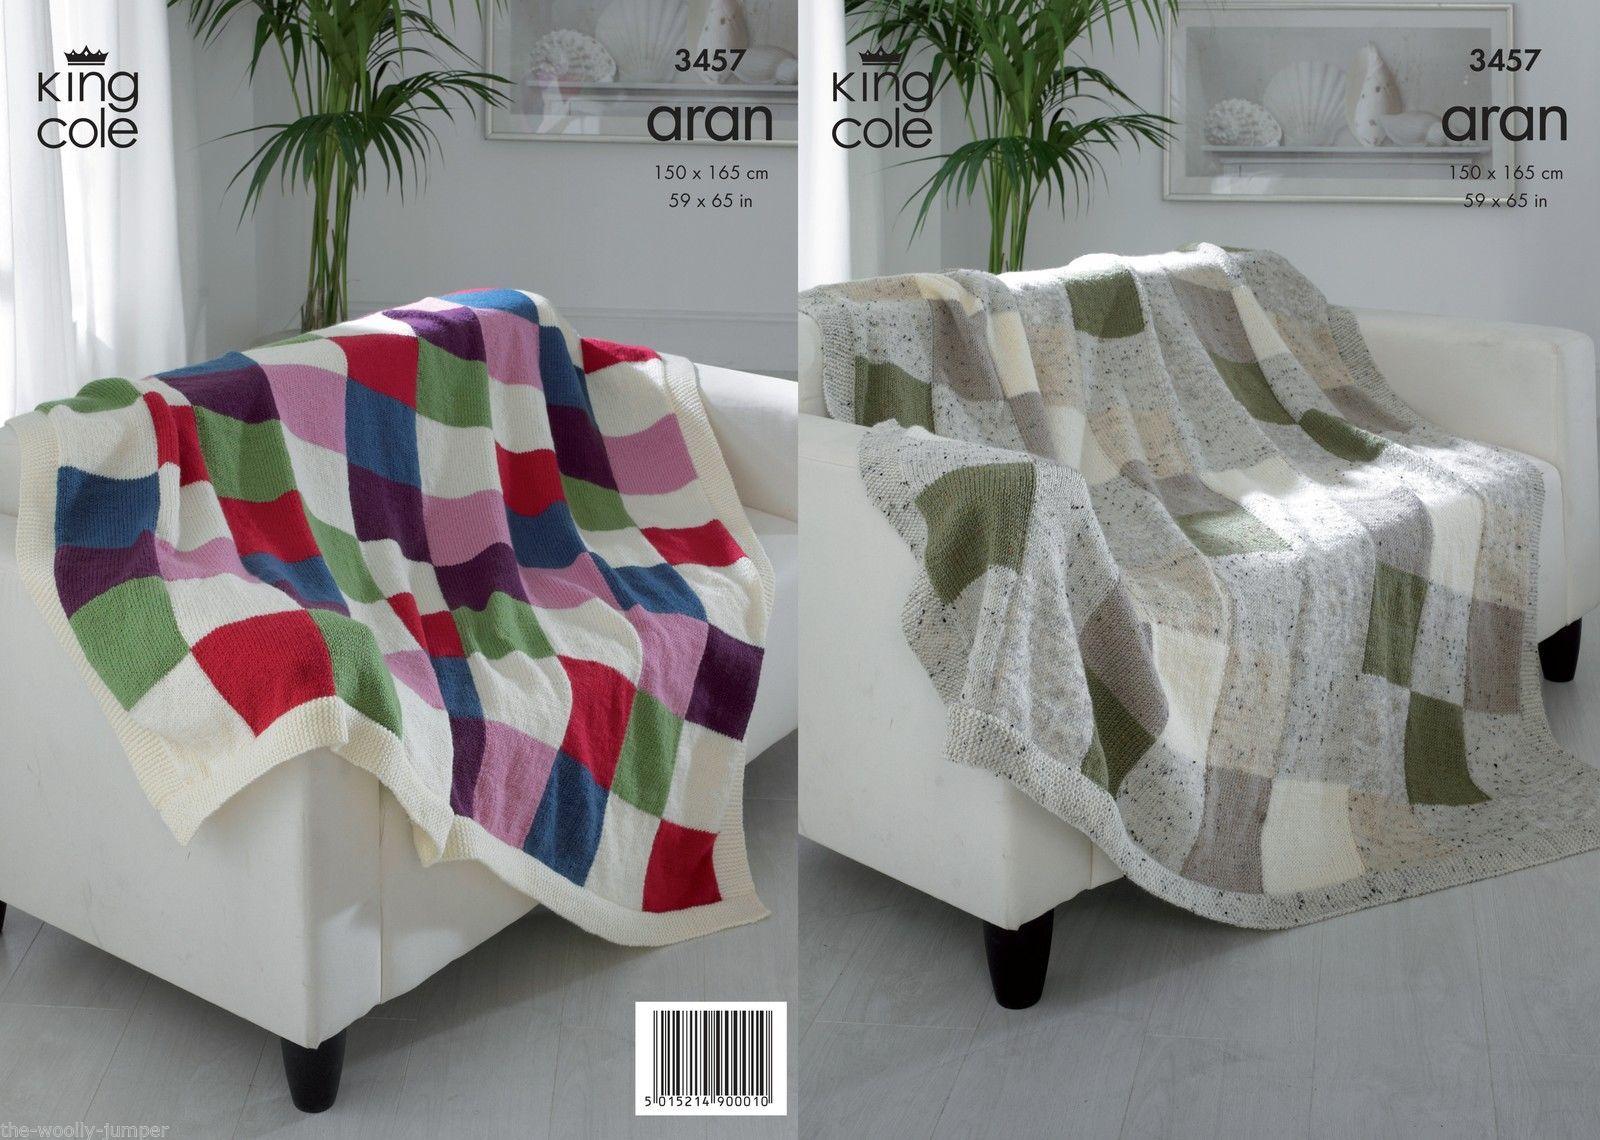 3457 king cole fashion aran afghan blanket knitting pattern 3457 king cole fashion aran afghan blanket knitting pattern size 150 x 165cm bankloansurffo Choice Image